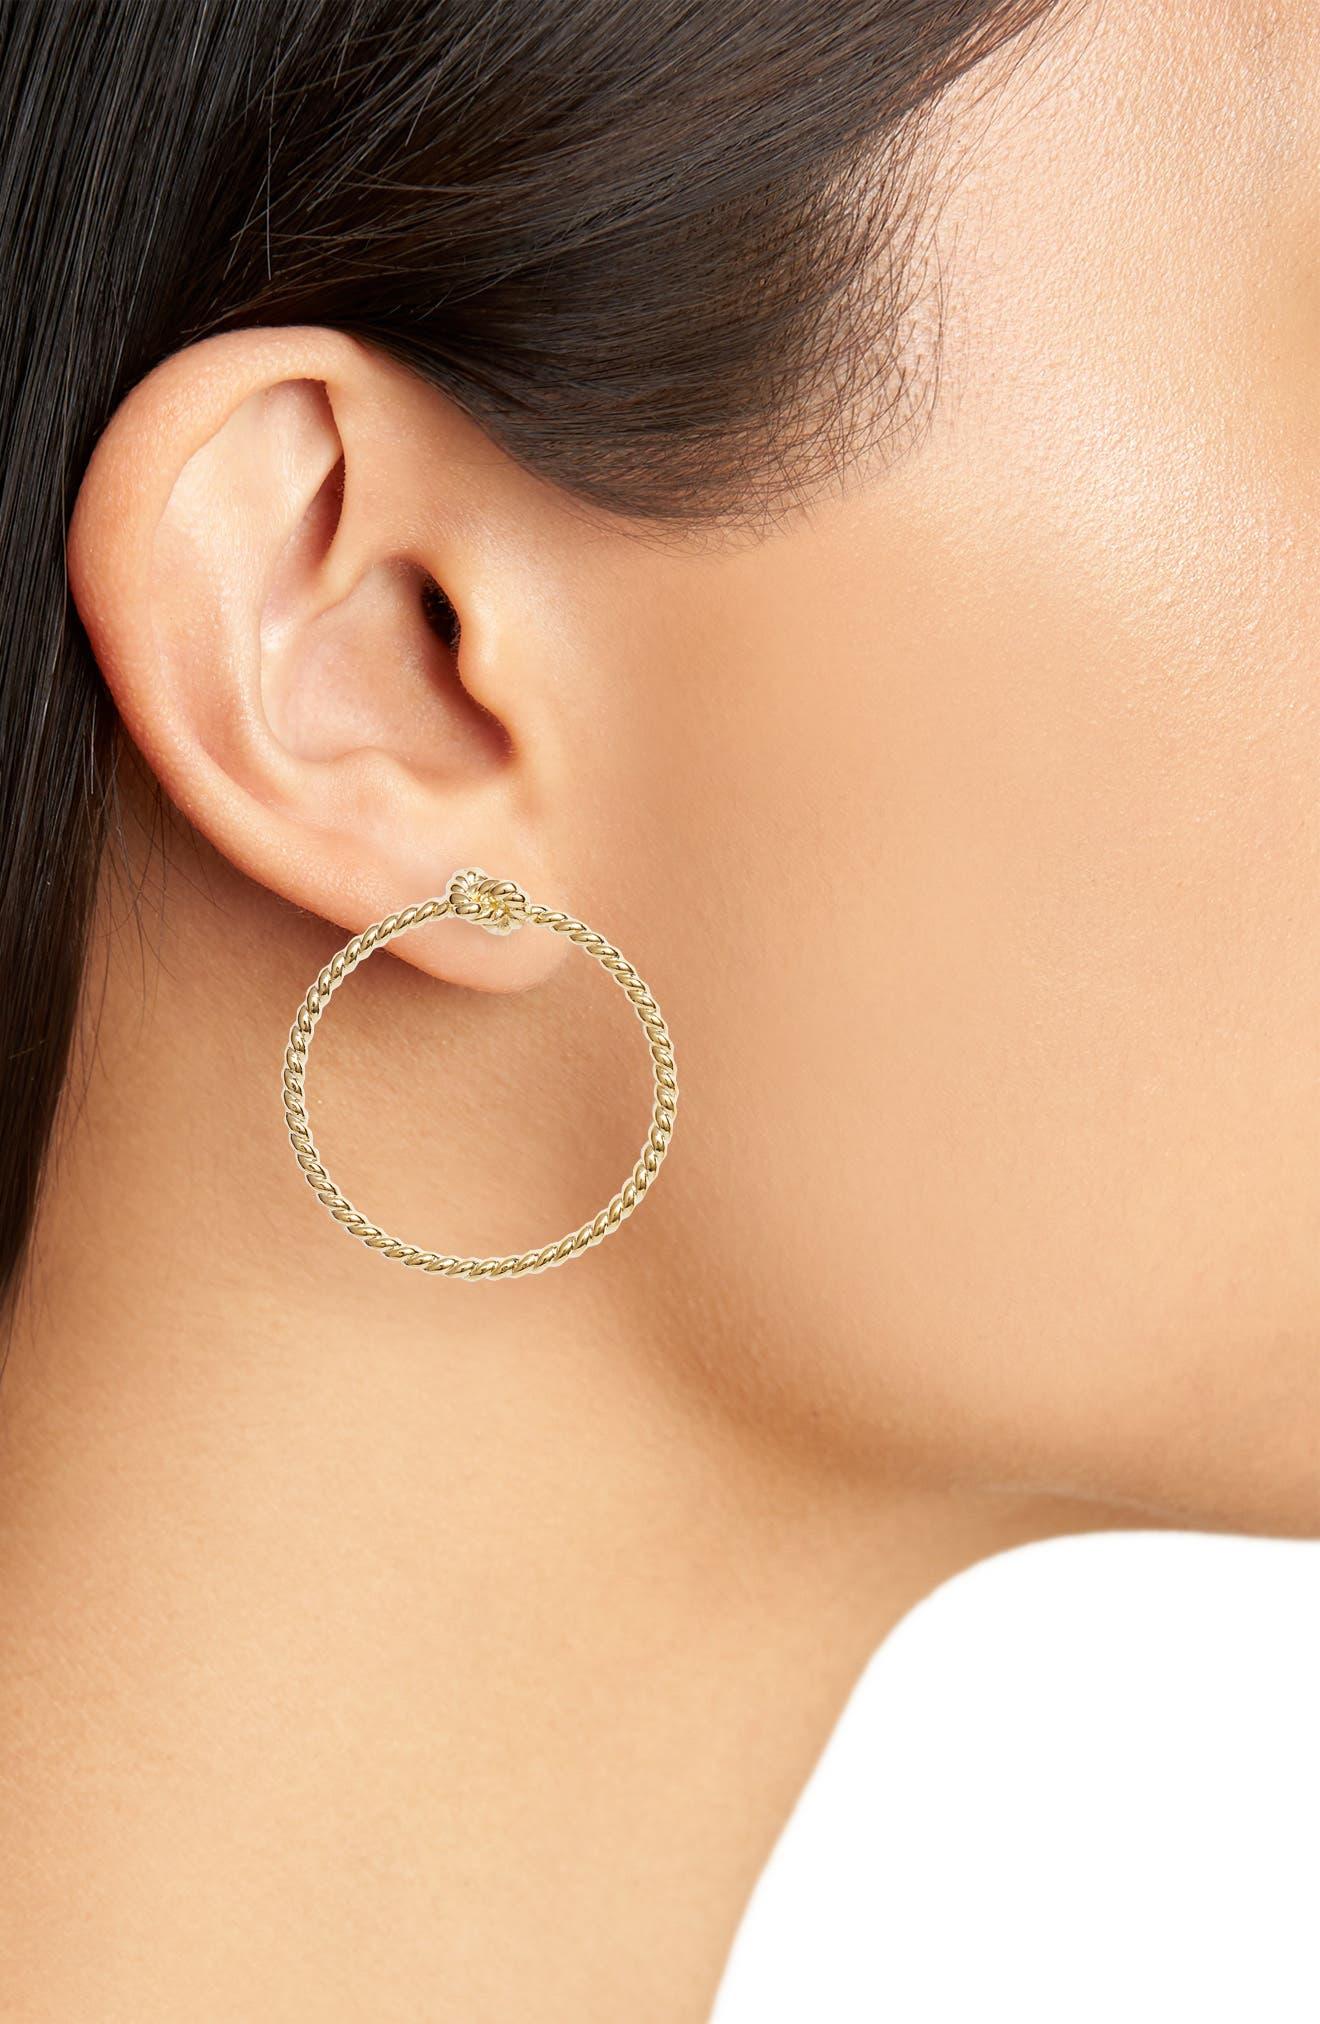 sailor knot door knocker hoop earrings,                             Alternate thumbnail 2, color,                             Gold